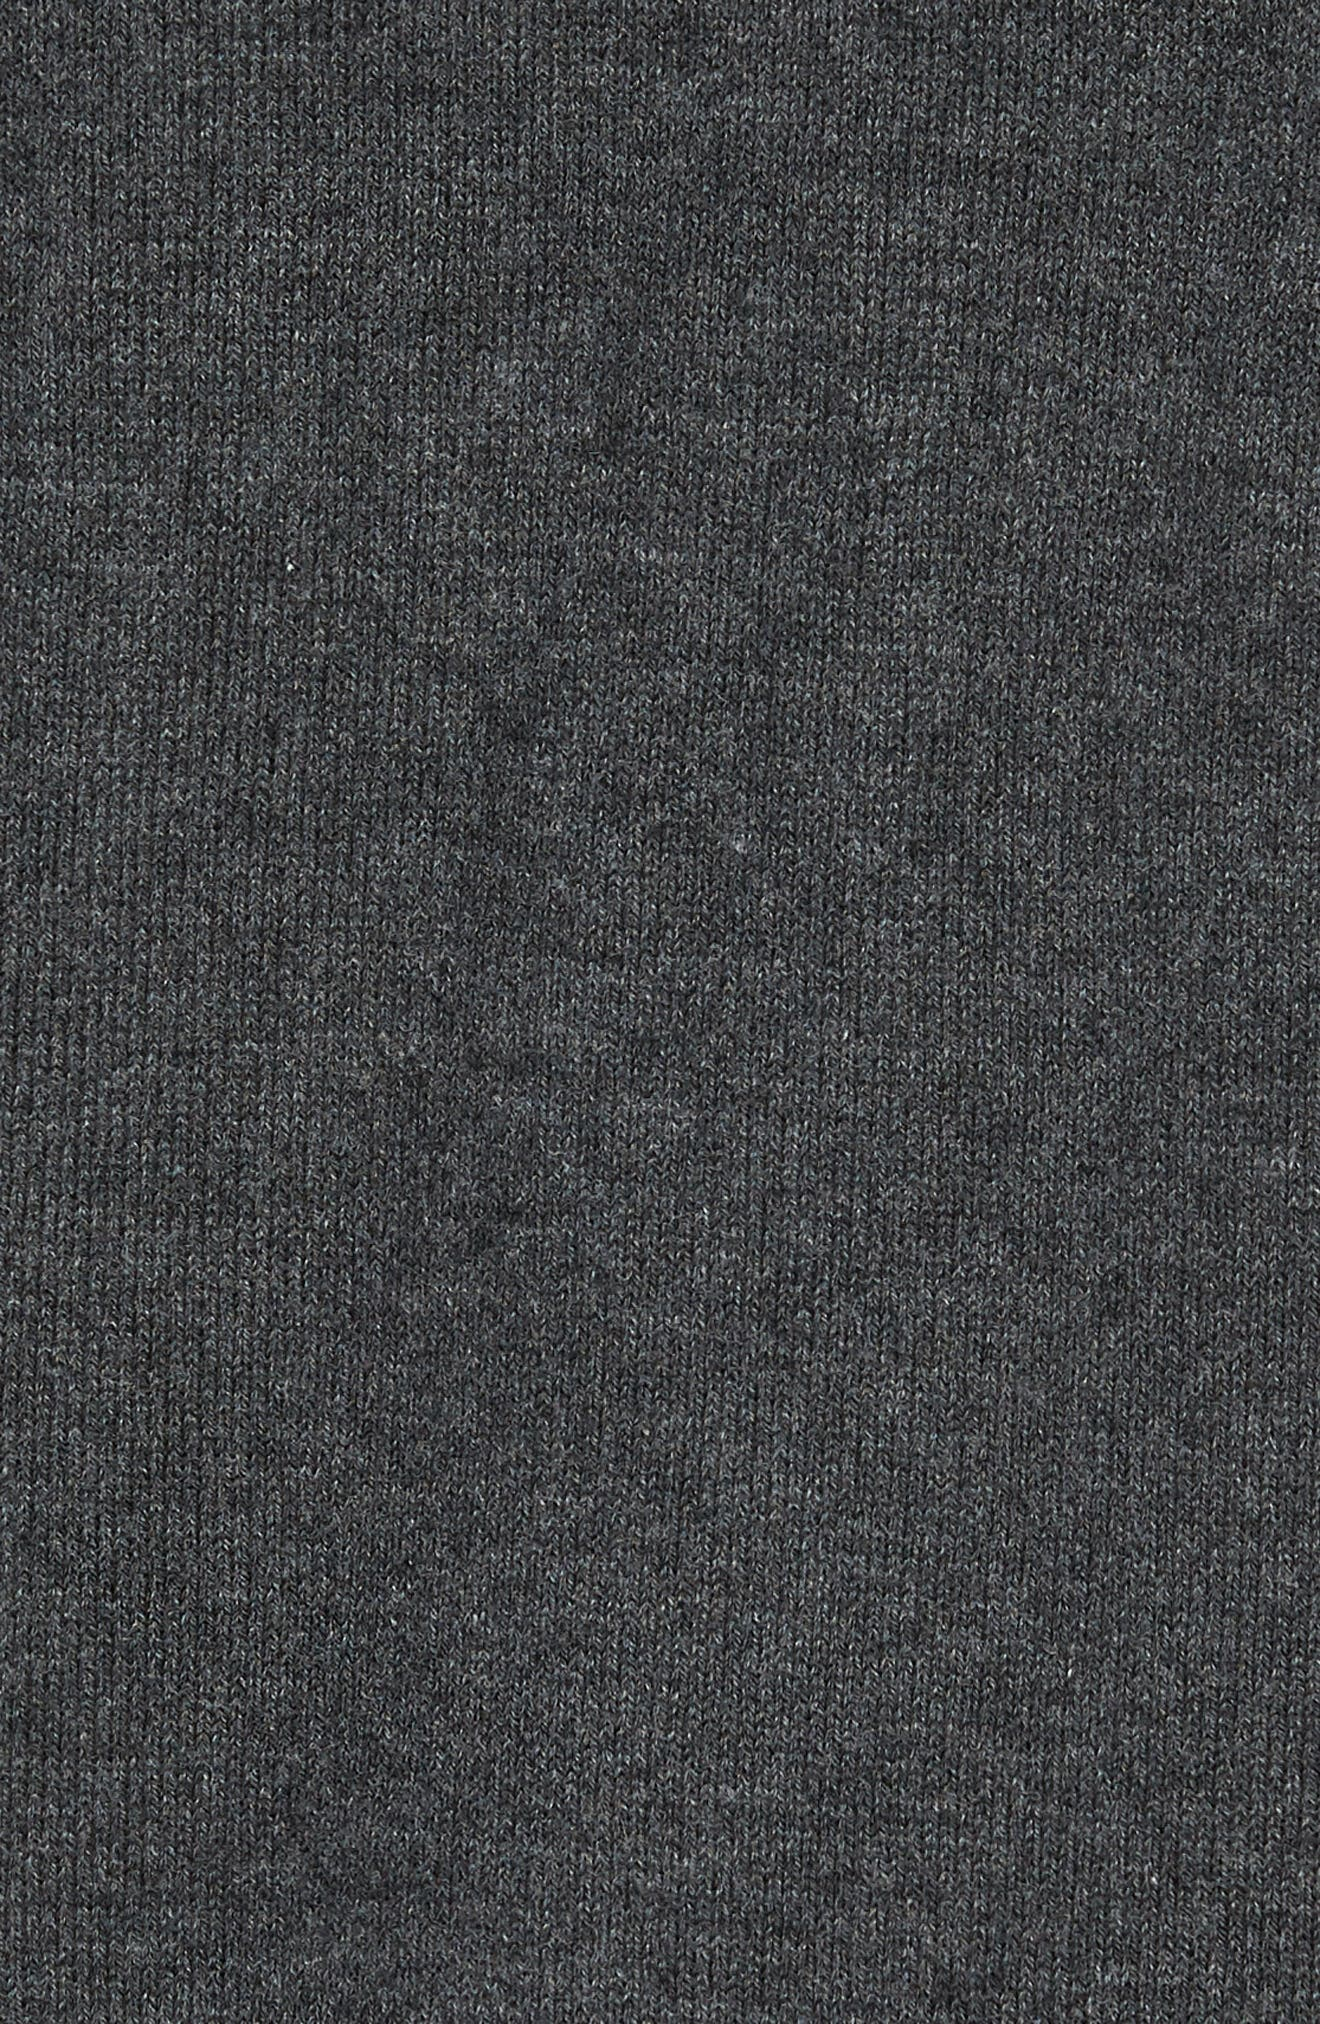 Houston Texans - Lakemont Regular Fit Quarter Zip Sweater,                             Alternate thumbnail 5, color,                             CHARCOAL HEATHER